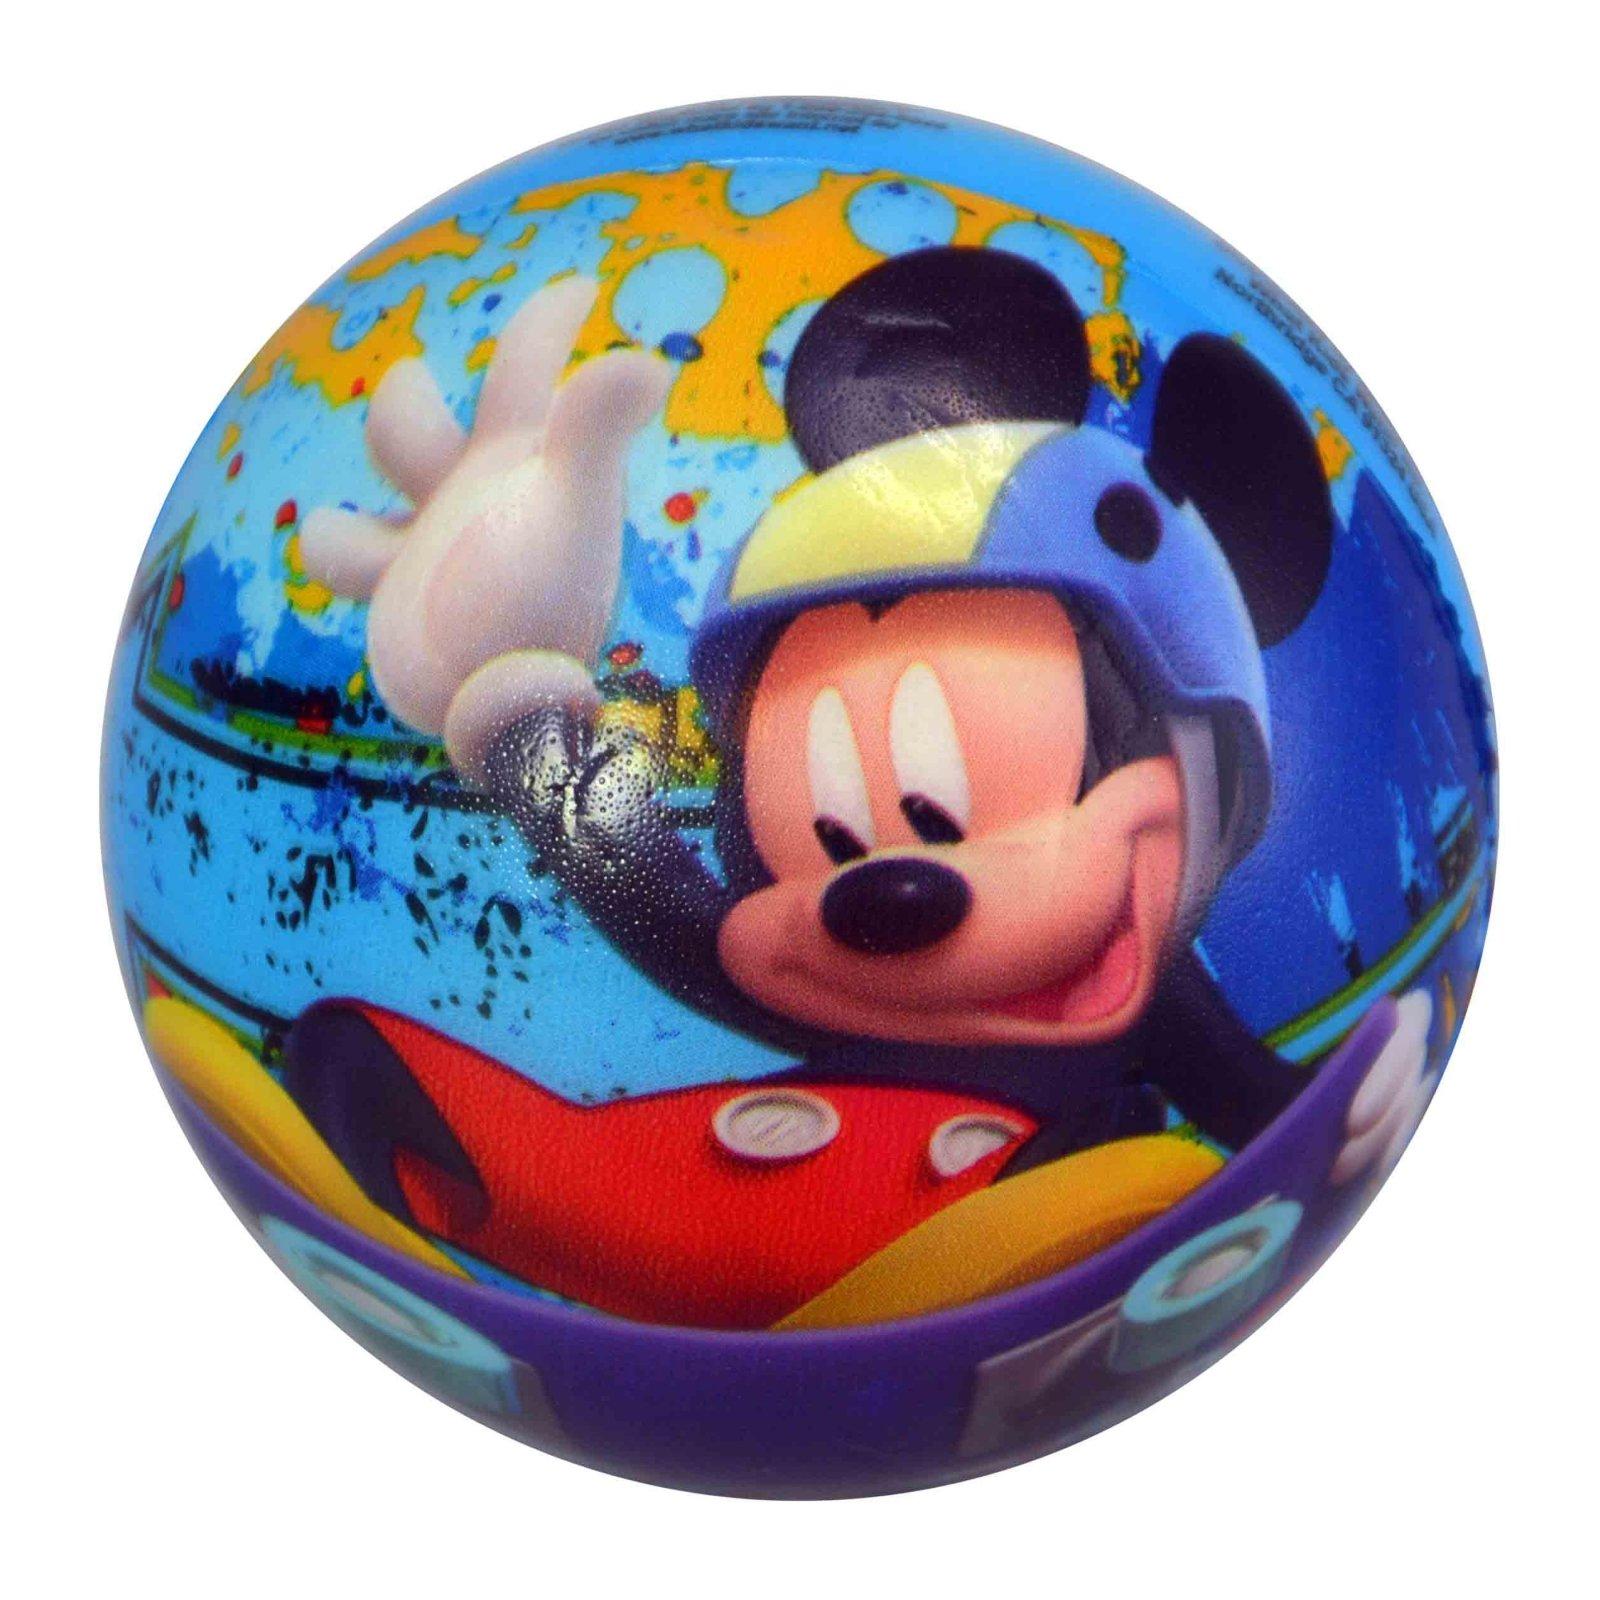 Disney Mickey Mouse Foam Ball - Blue